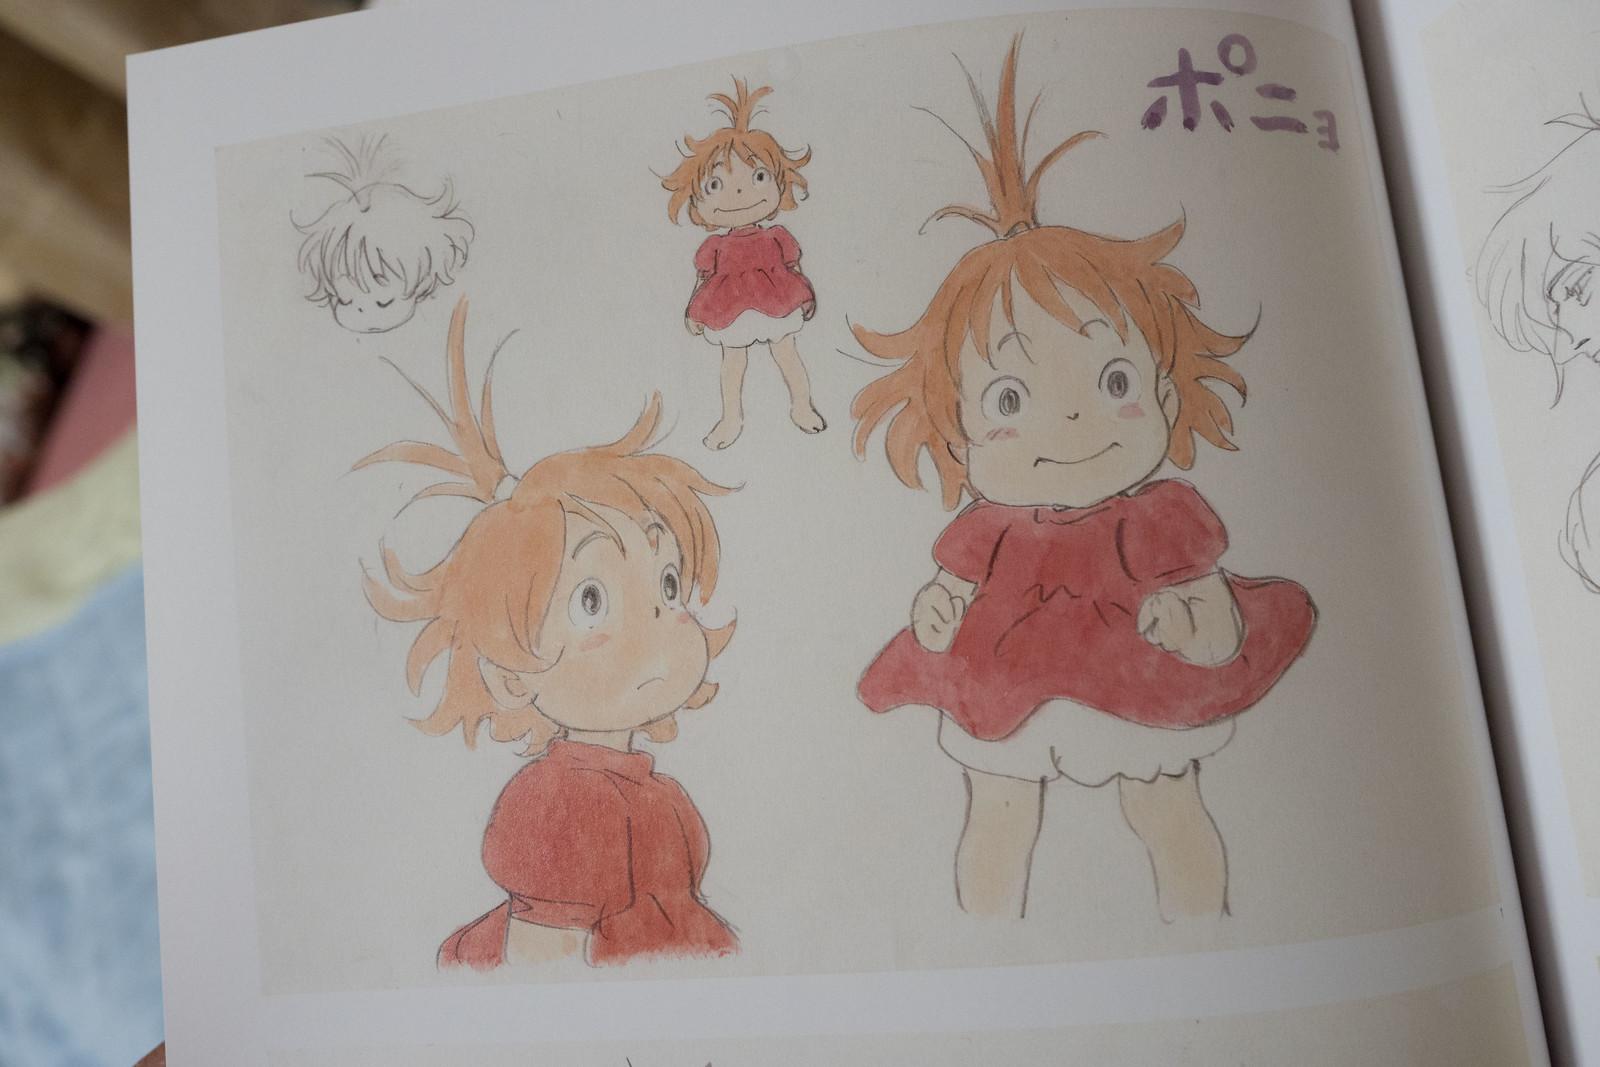 Ghibli_katsuyakondo-43